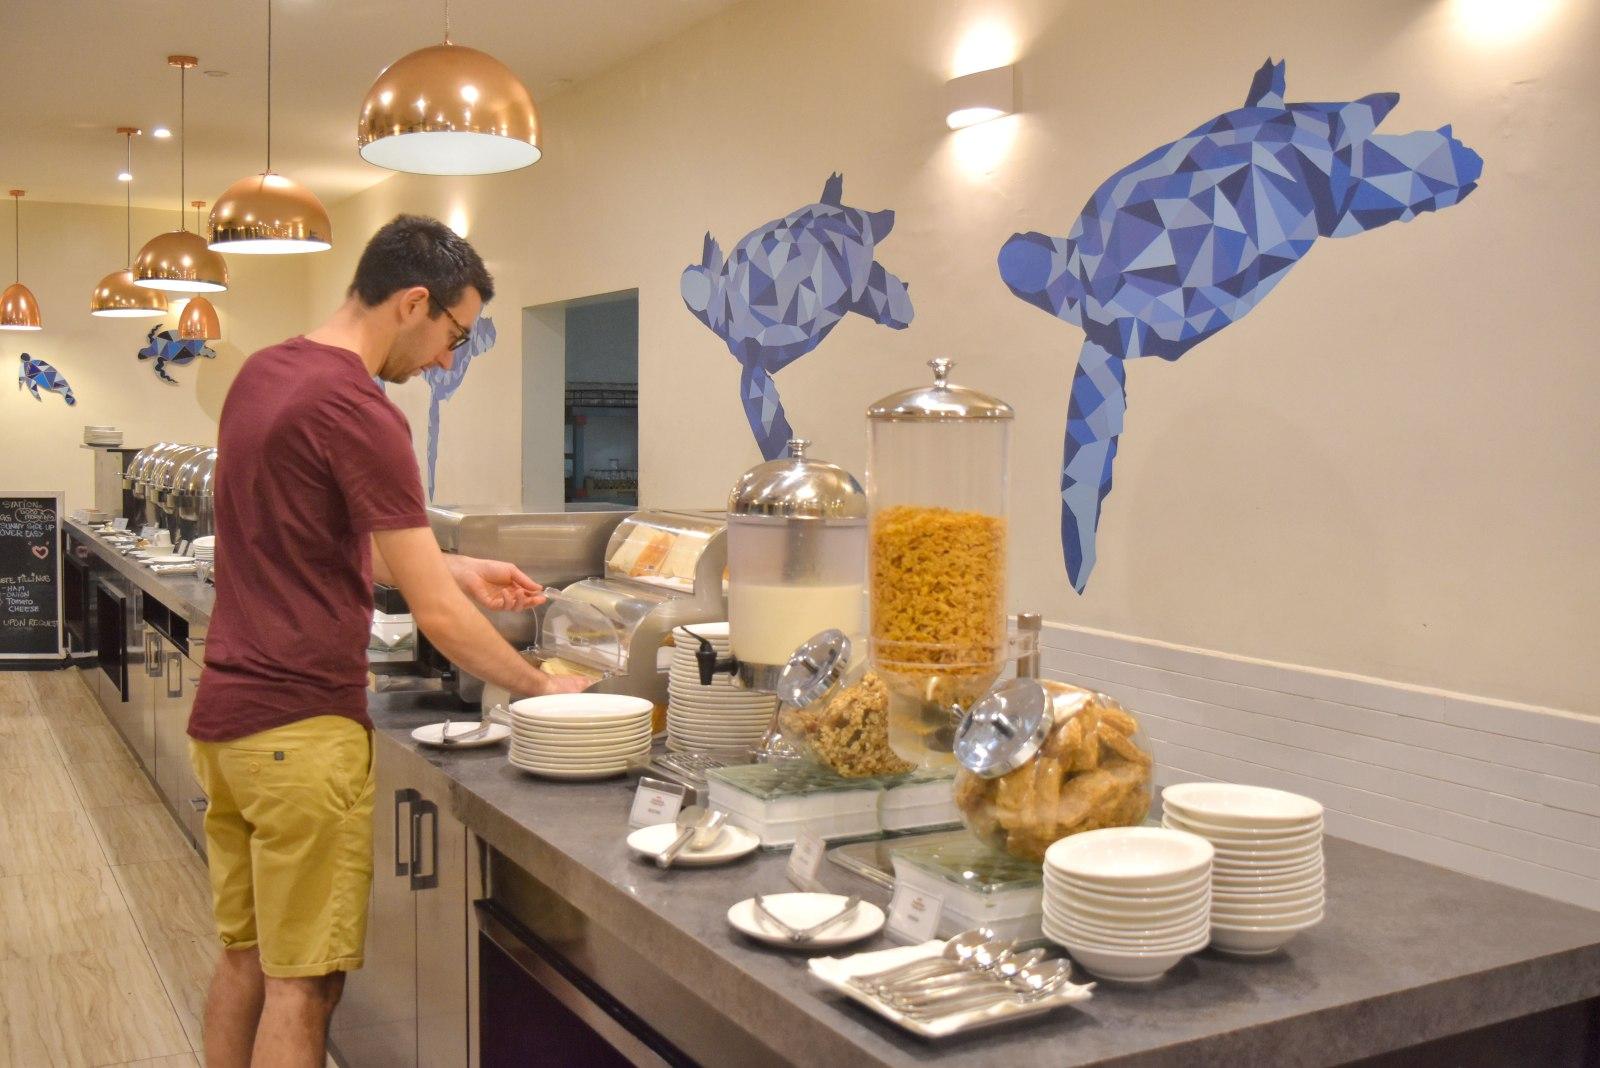 Should You Buy a Resort Meal Plan in Tonga?